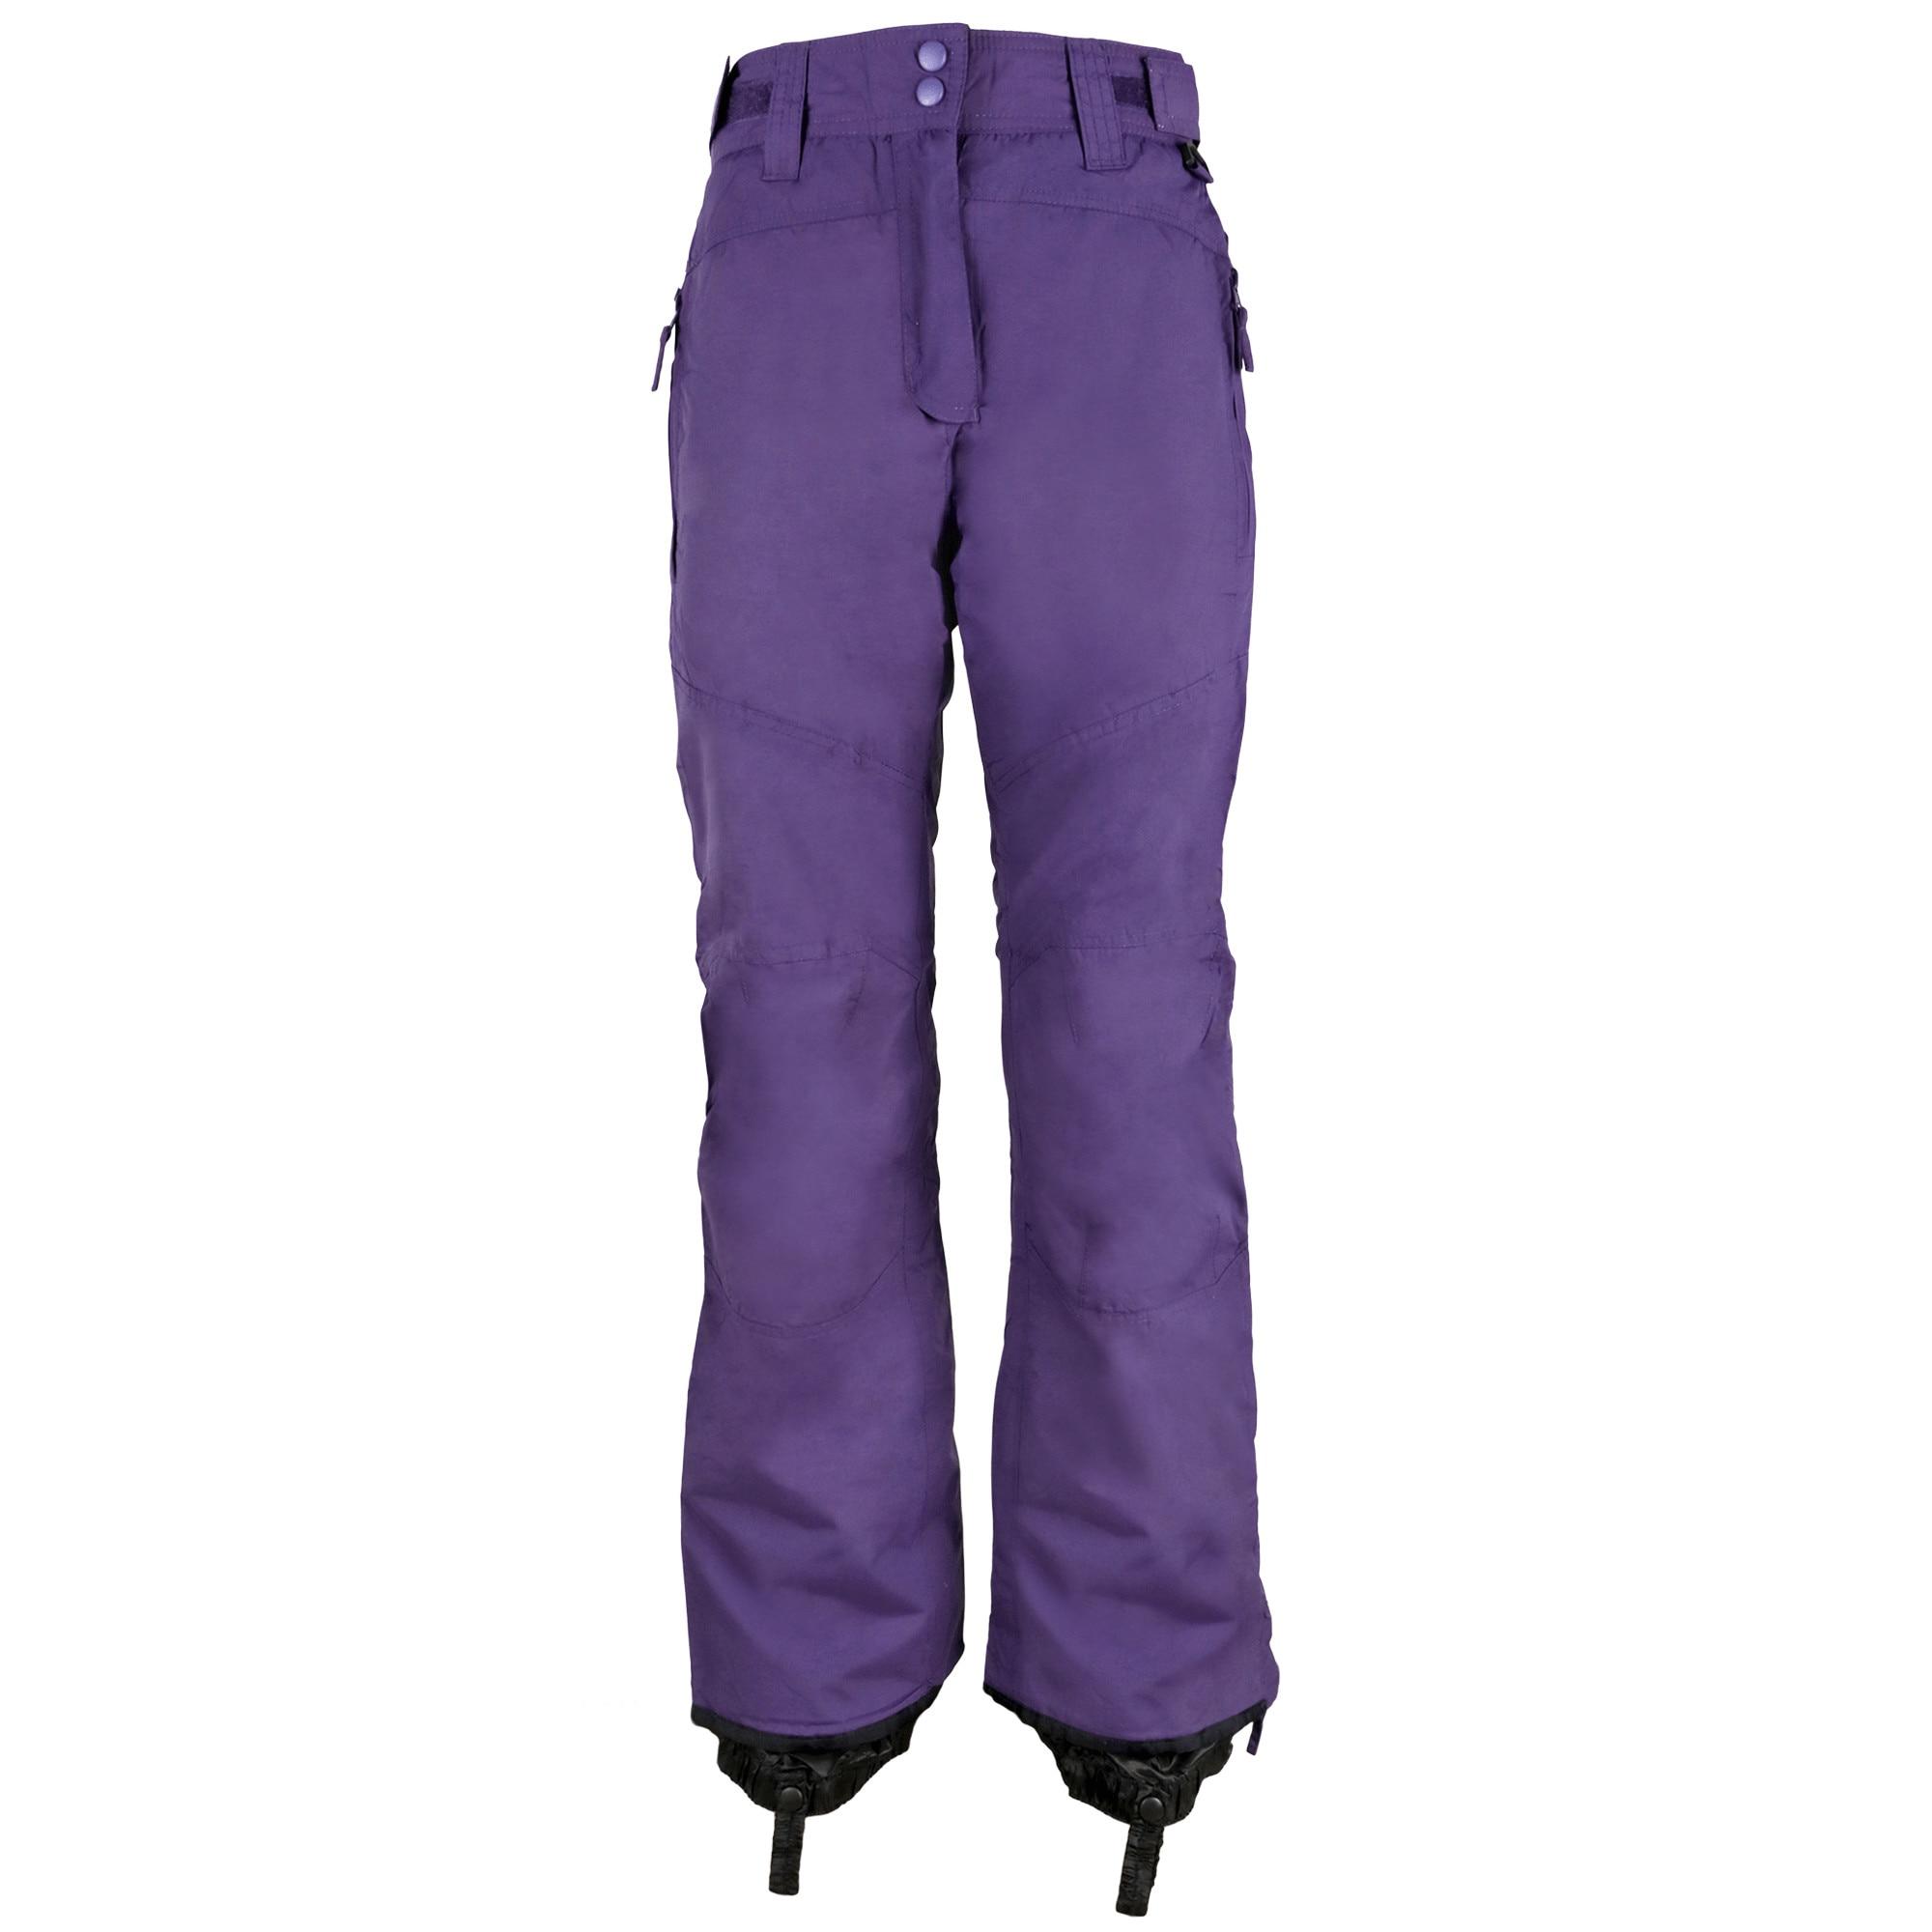 marimea 7 oferta specifica cel mai bun site web Pantaloni ski dama Crivit Sports, impermeabili, rezistenti la vant  puternic, Violet, 40 EU - eMAG.ro